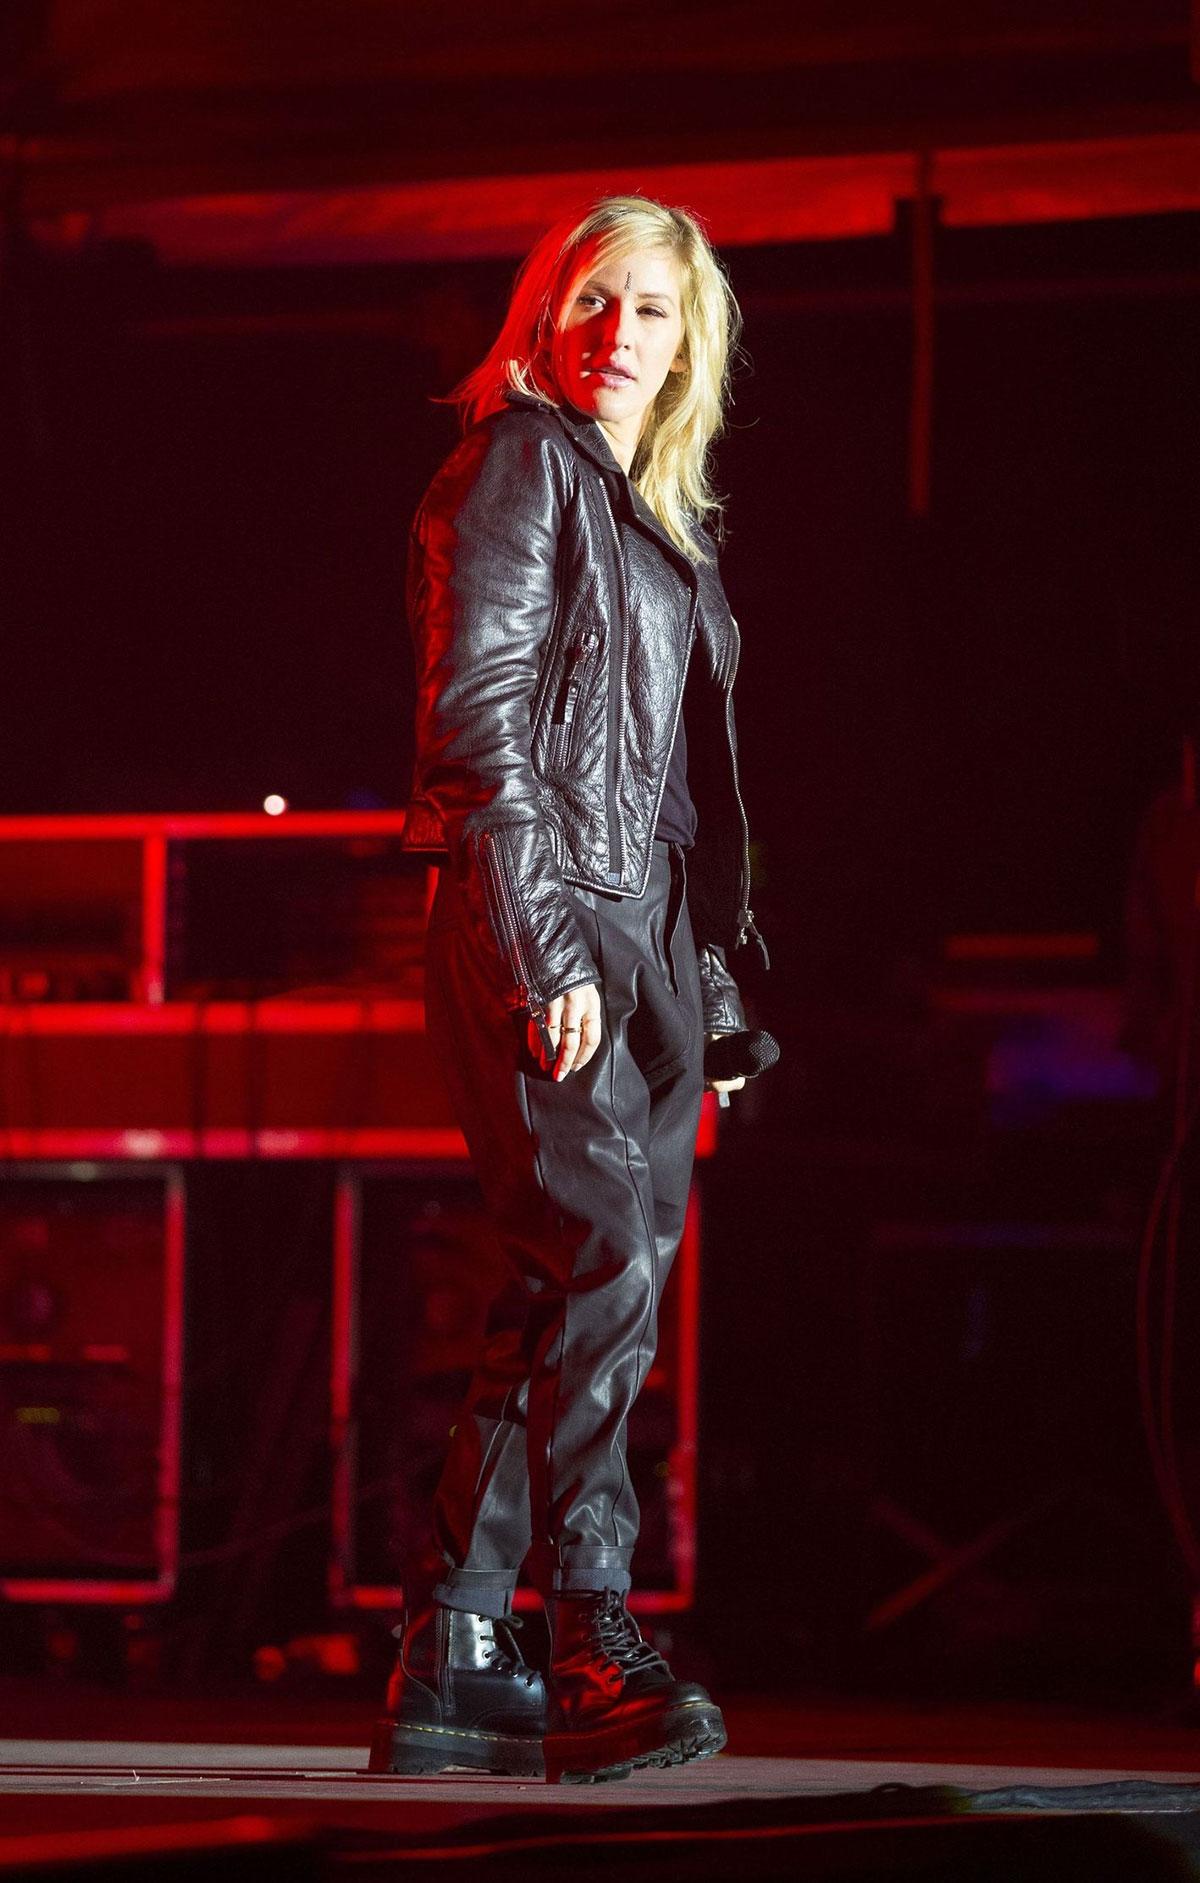 Ellie Goulding performs at Sundown Festival